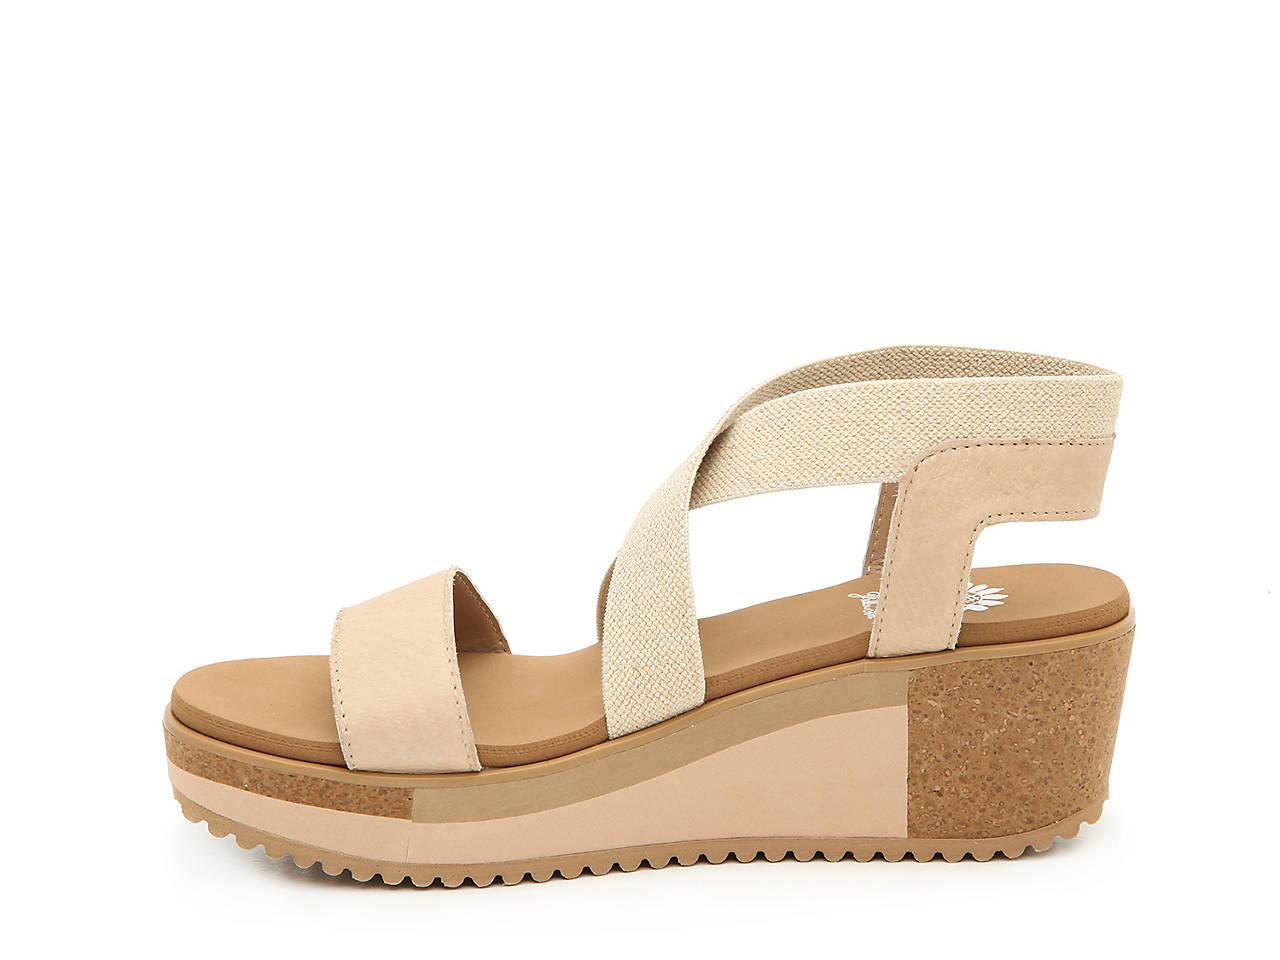 b56159e86696 Yellow Box Janalee Wedge Sandal Women s Shoes